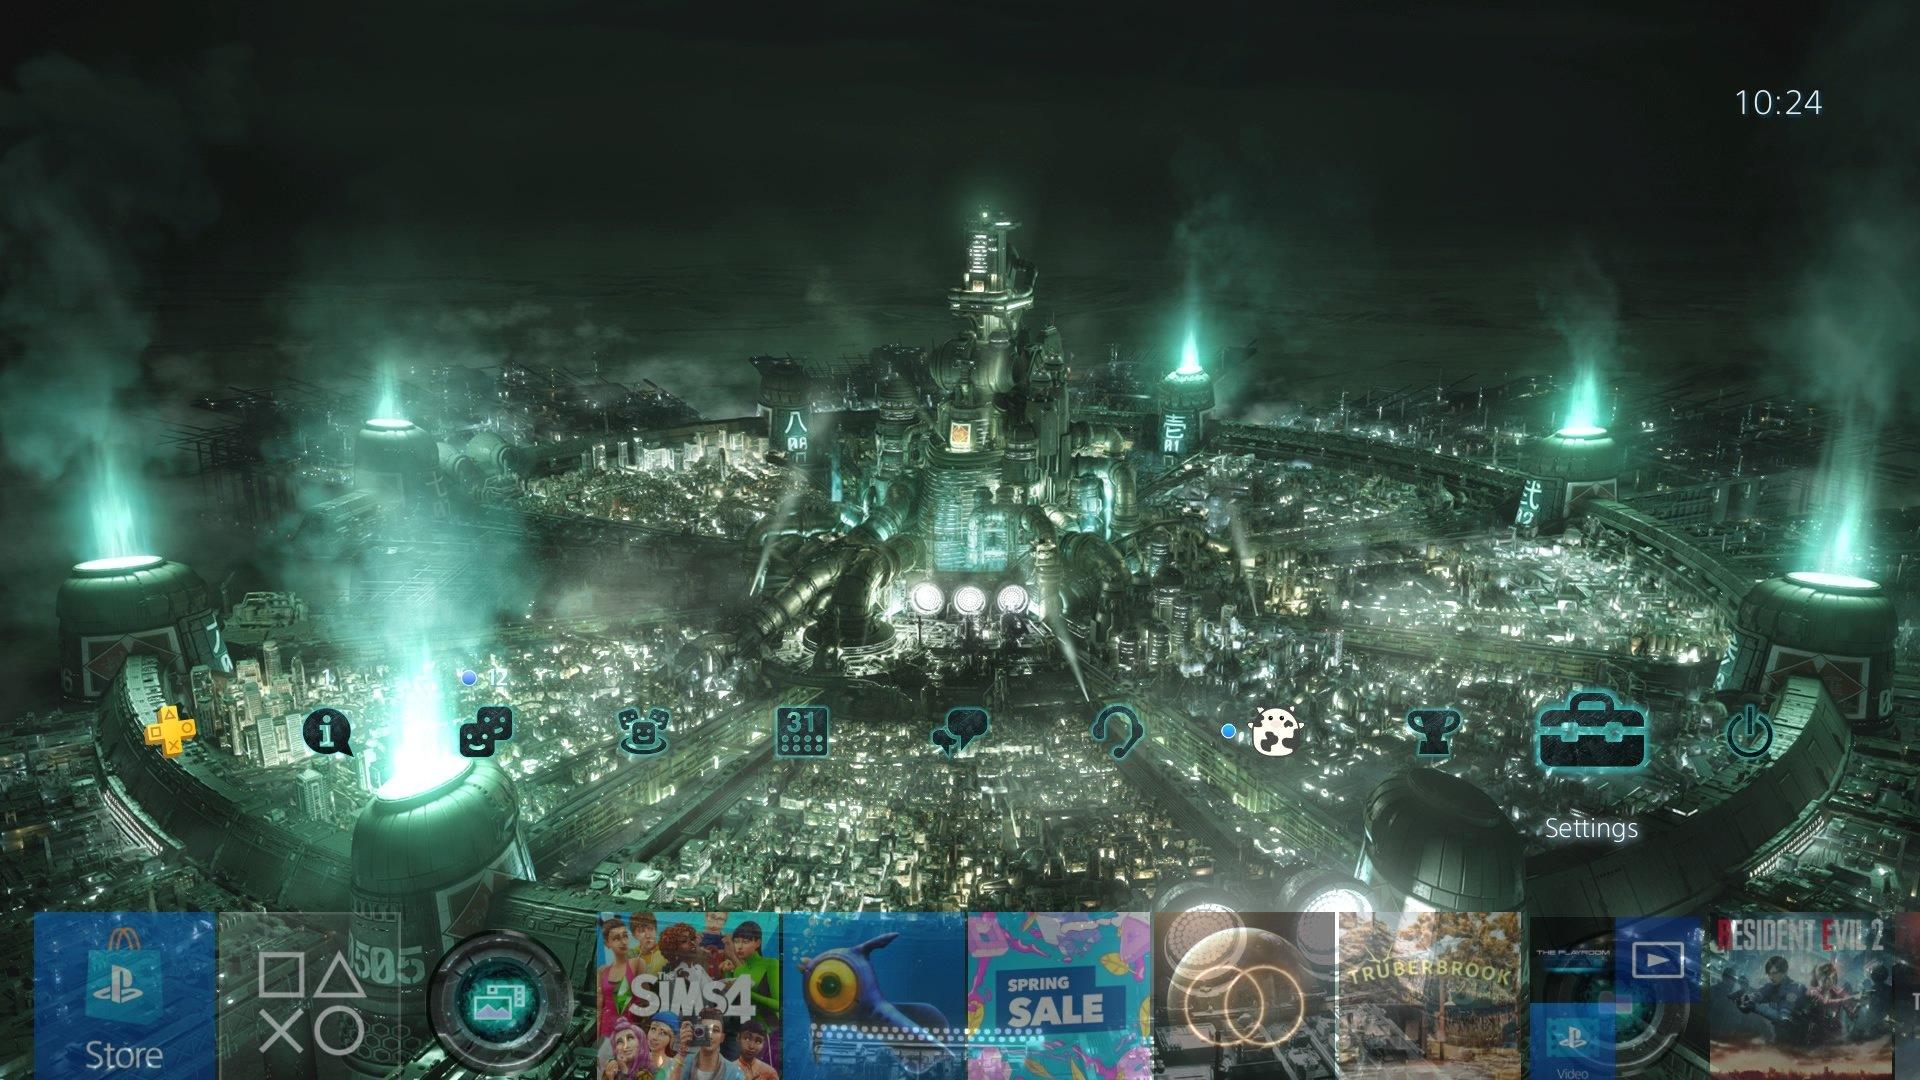 final fantasy vii remake cloud theme.original - PlayStation 4 - Guida: i migliori temi gratuiti da scaricare